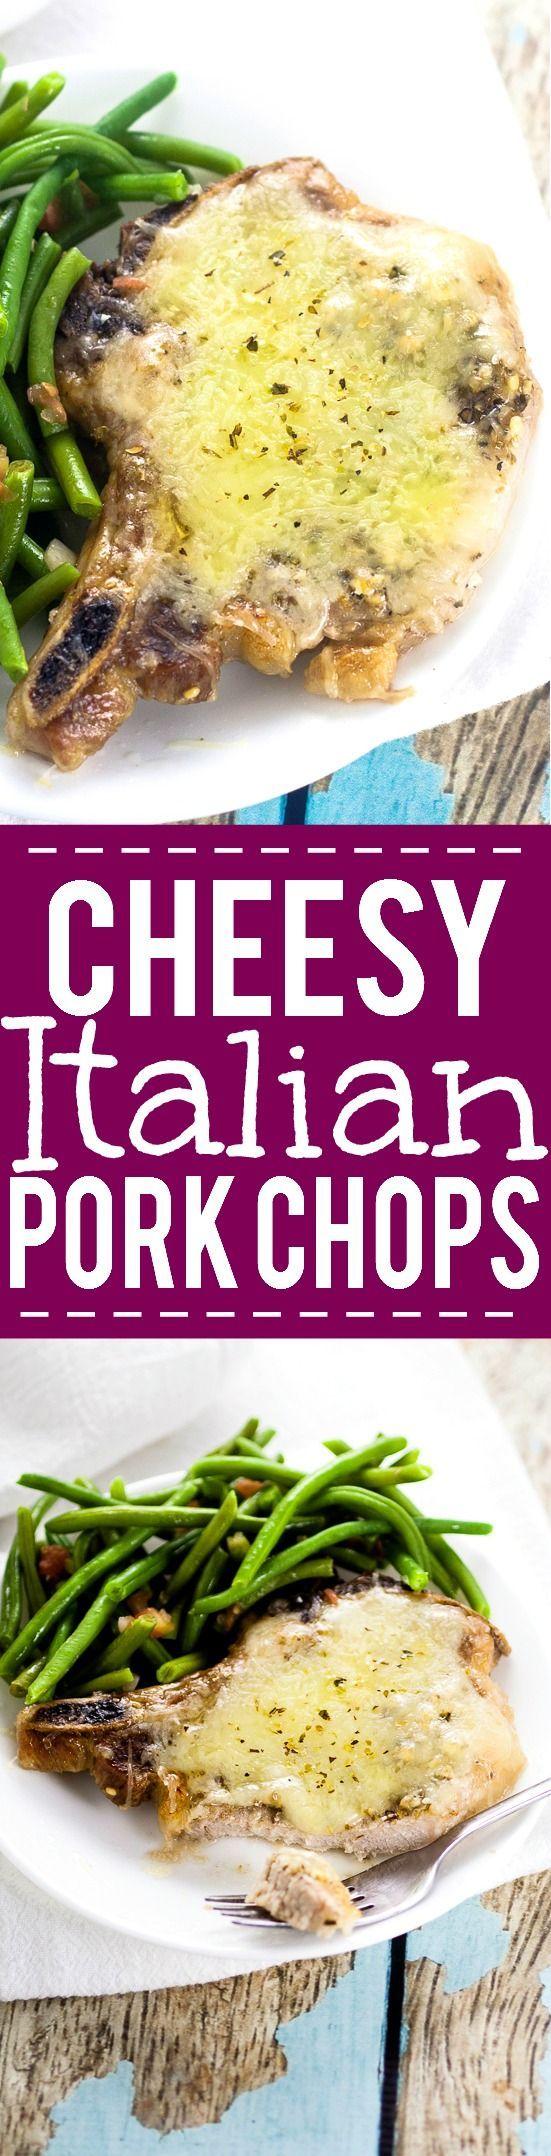 Cheesy Italian Pork Chops Recipe - Juicy, flavorful pork chops, baked in…